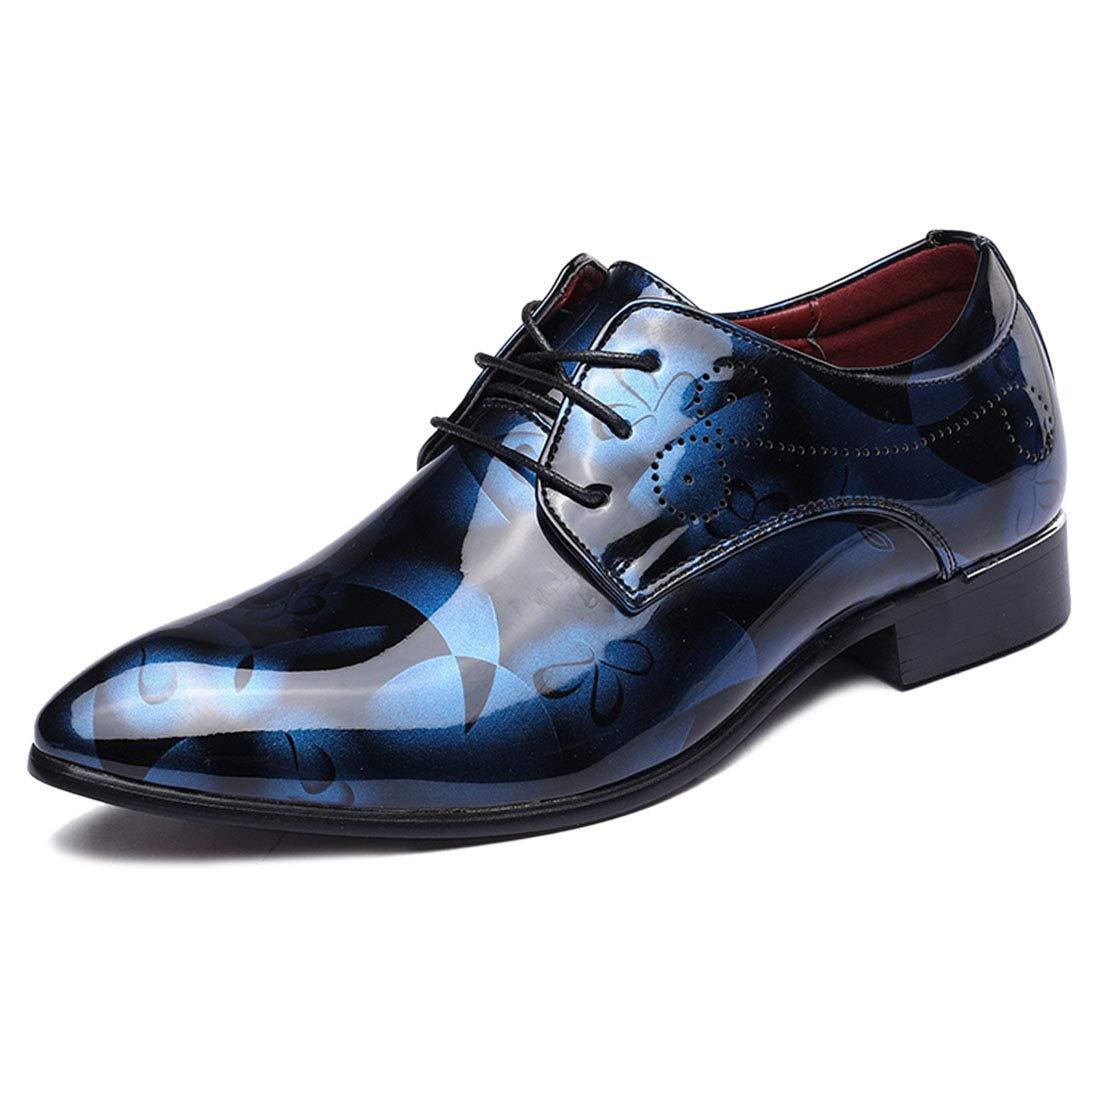 Jiyaru Oxford Dress Shoes for Men Formal Business Lace Up Blue Asian 48 / US 11.5